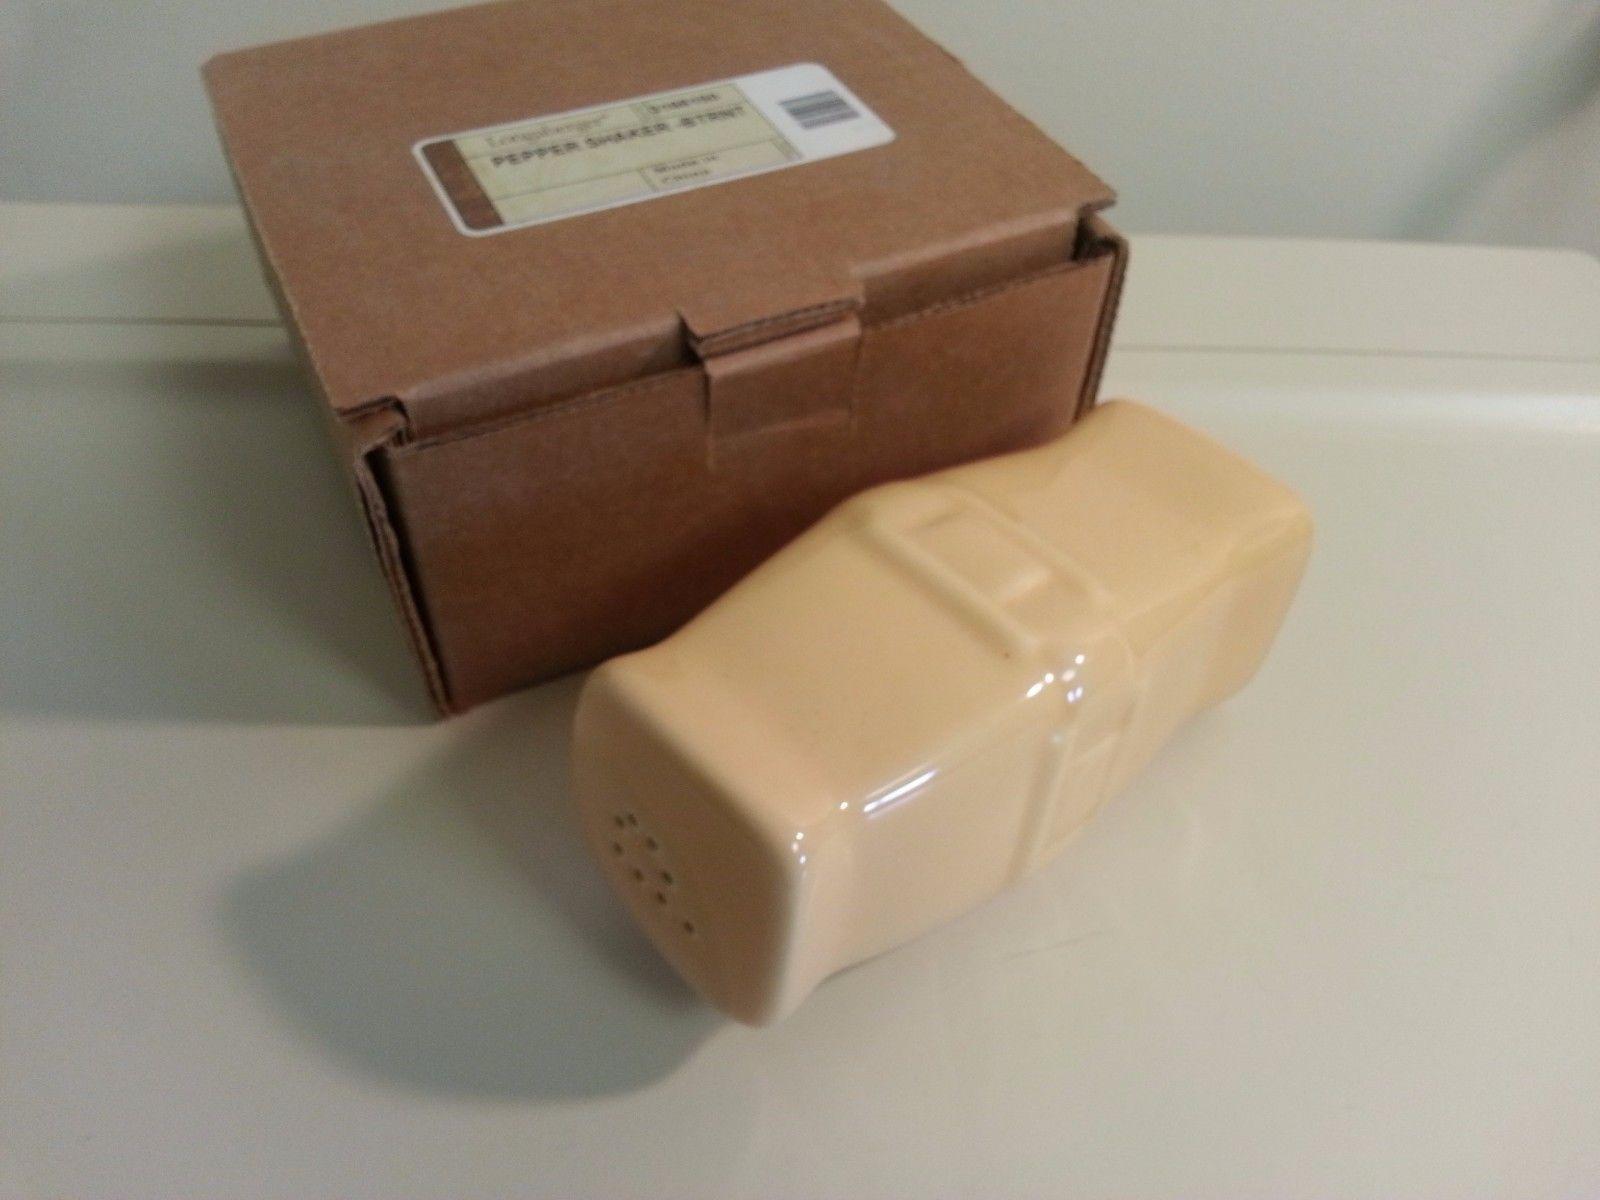 Longaberger Butternut Pepper Shaker New in Box 3166150